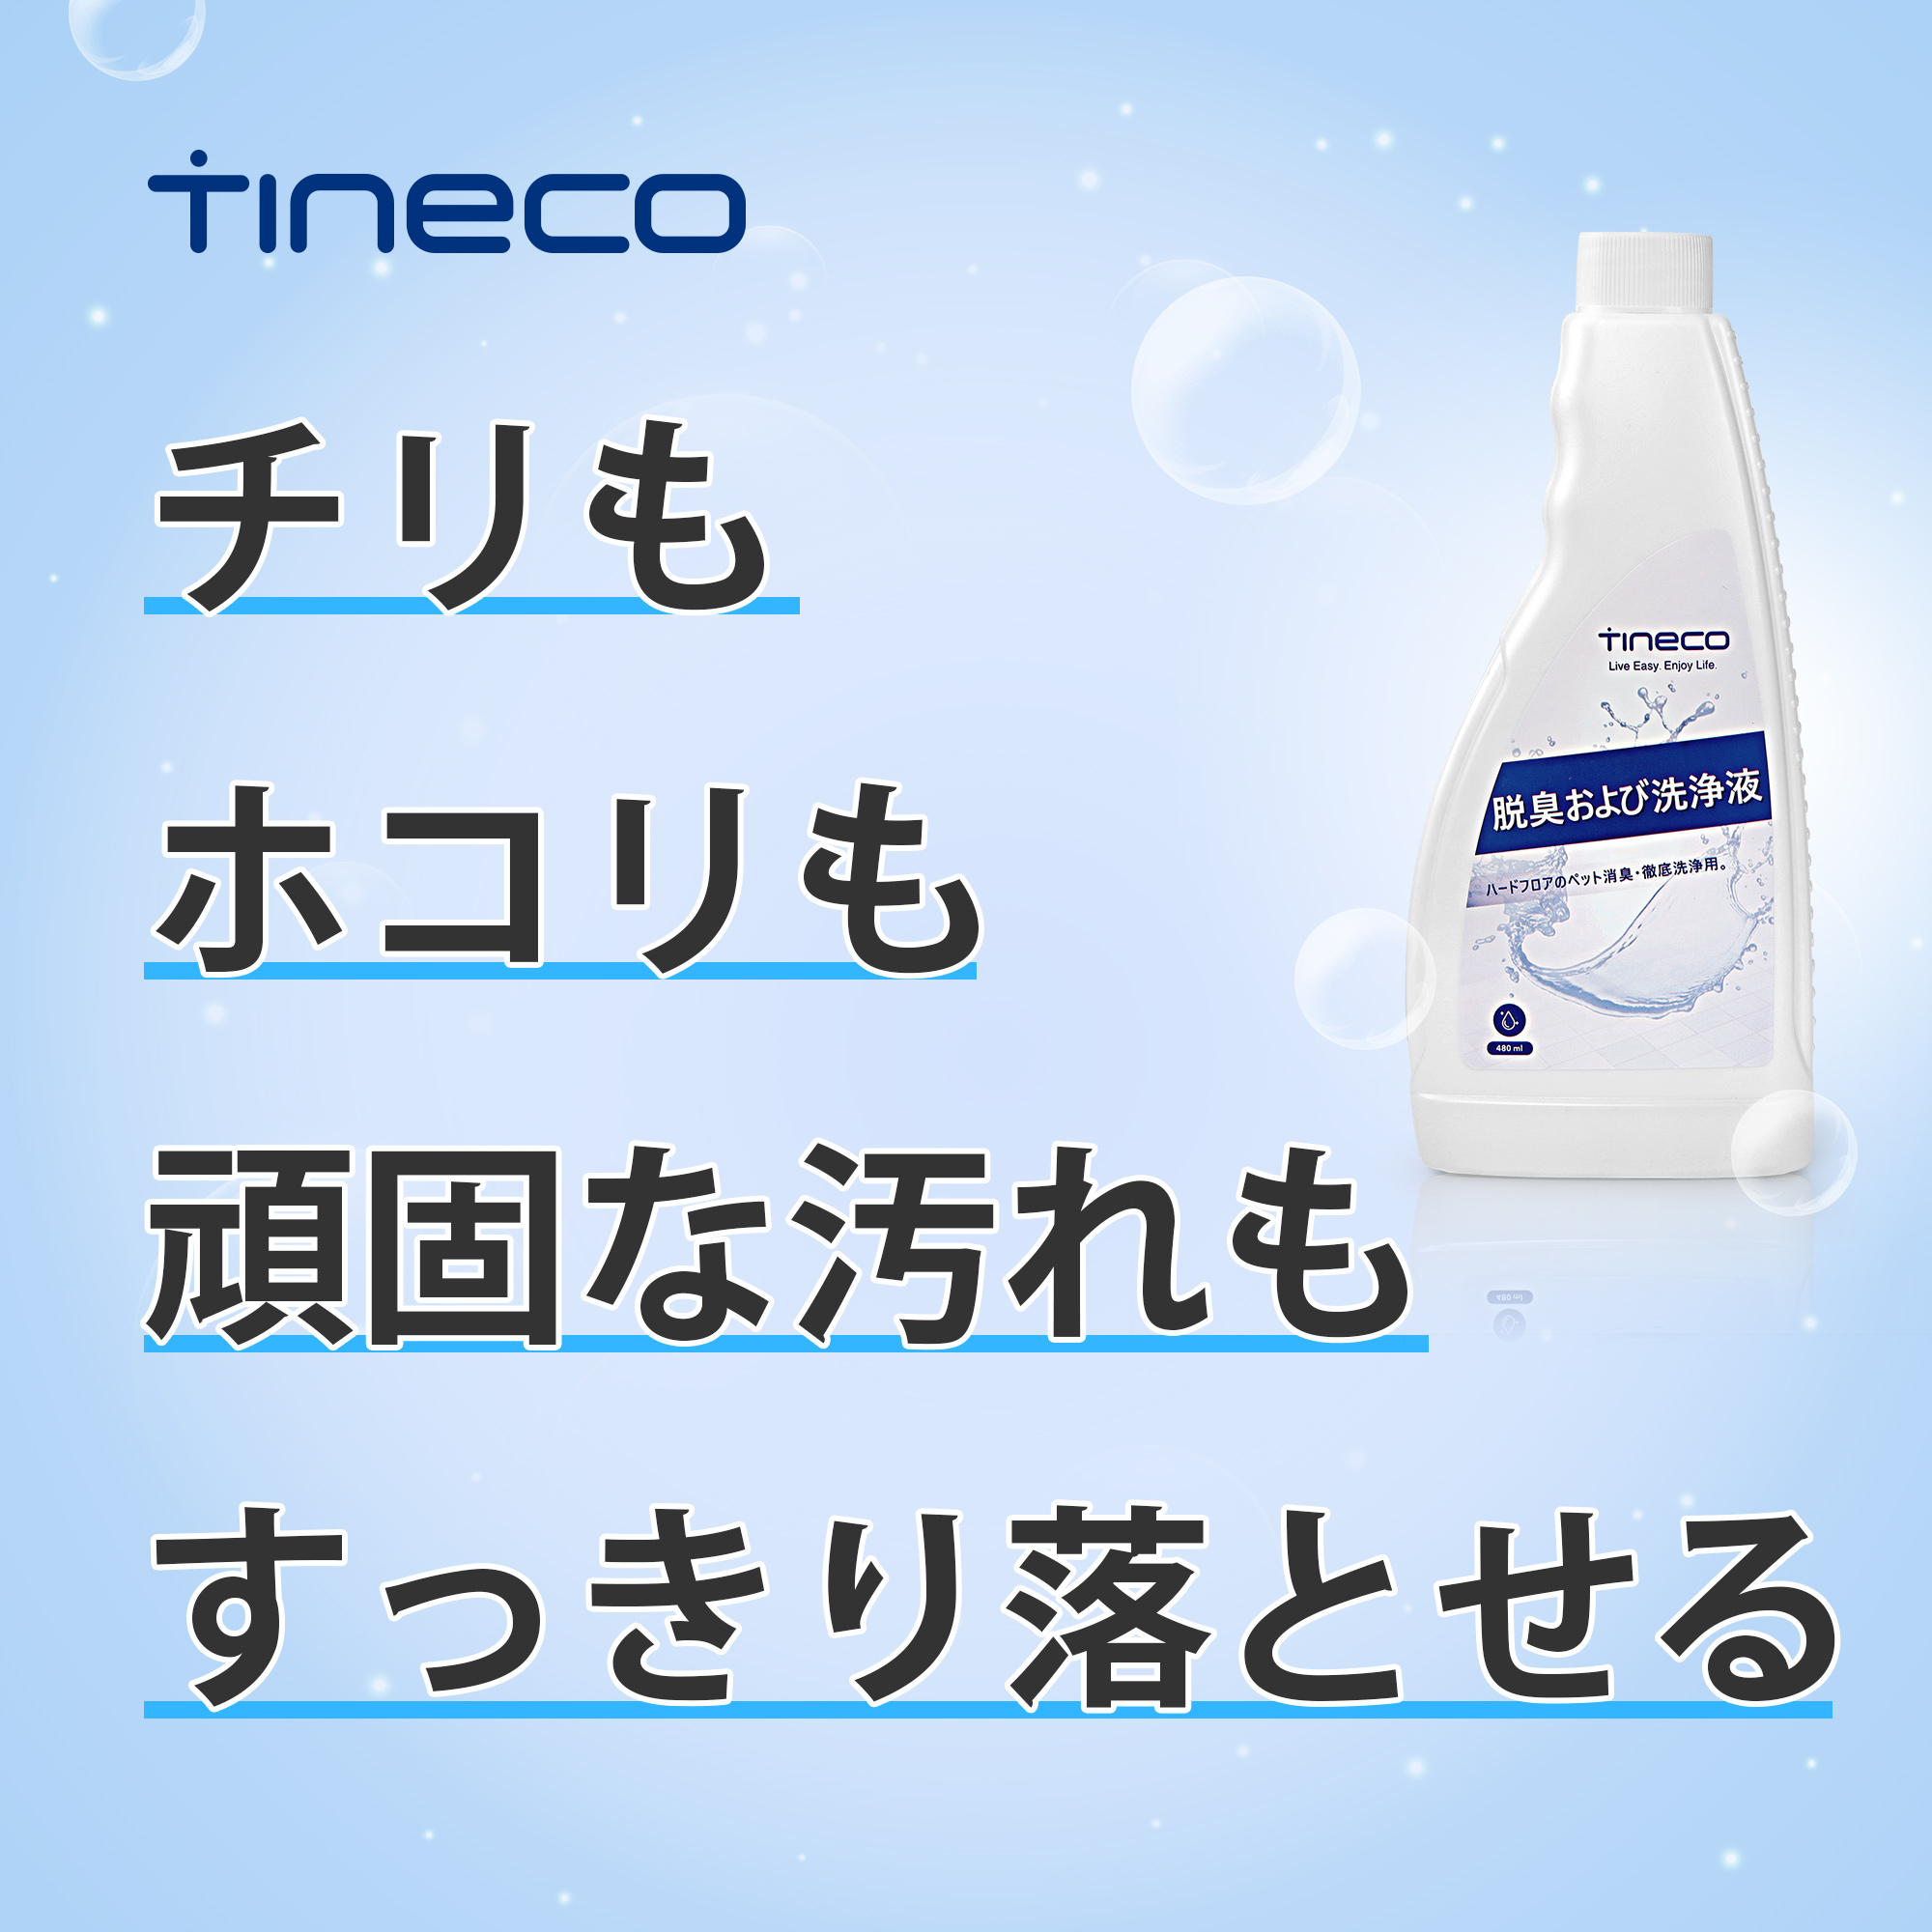 Tineco ティネコ セール 登場から人気沸騰 未使用品 iFloor3 S3専用洗剤 FLOORONE